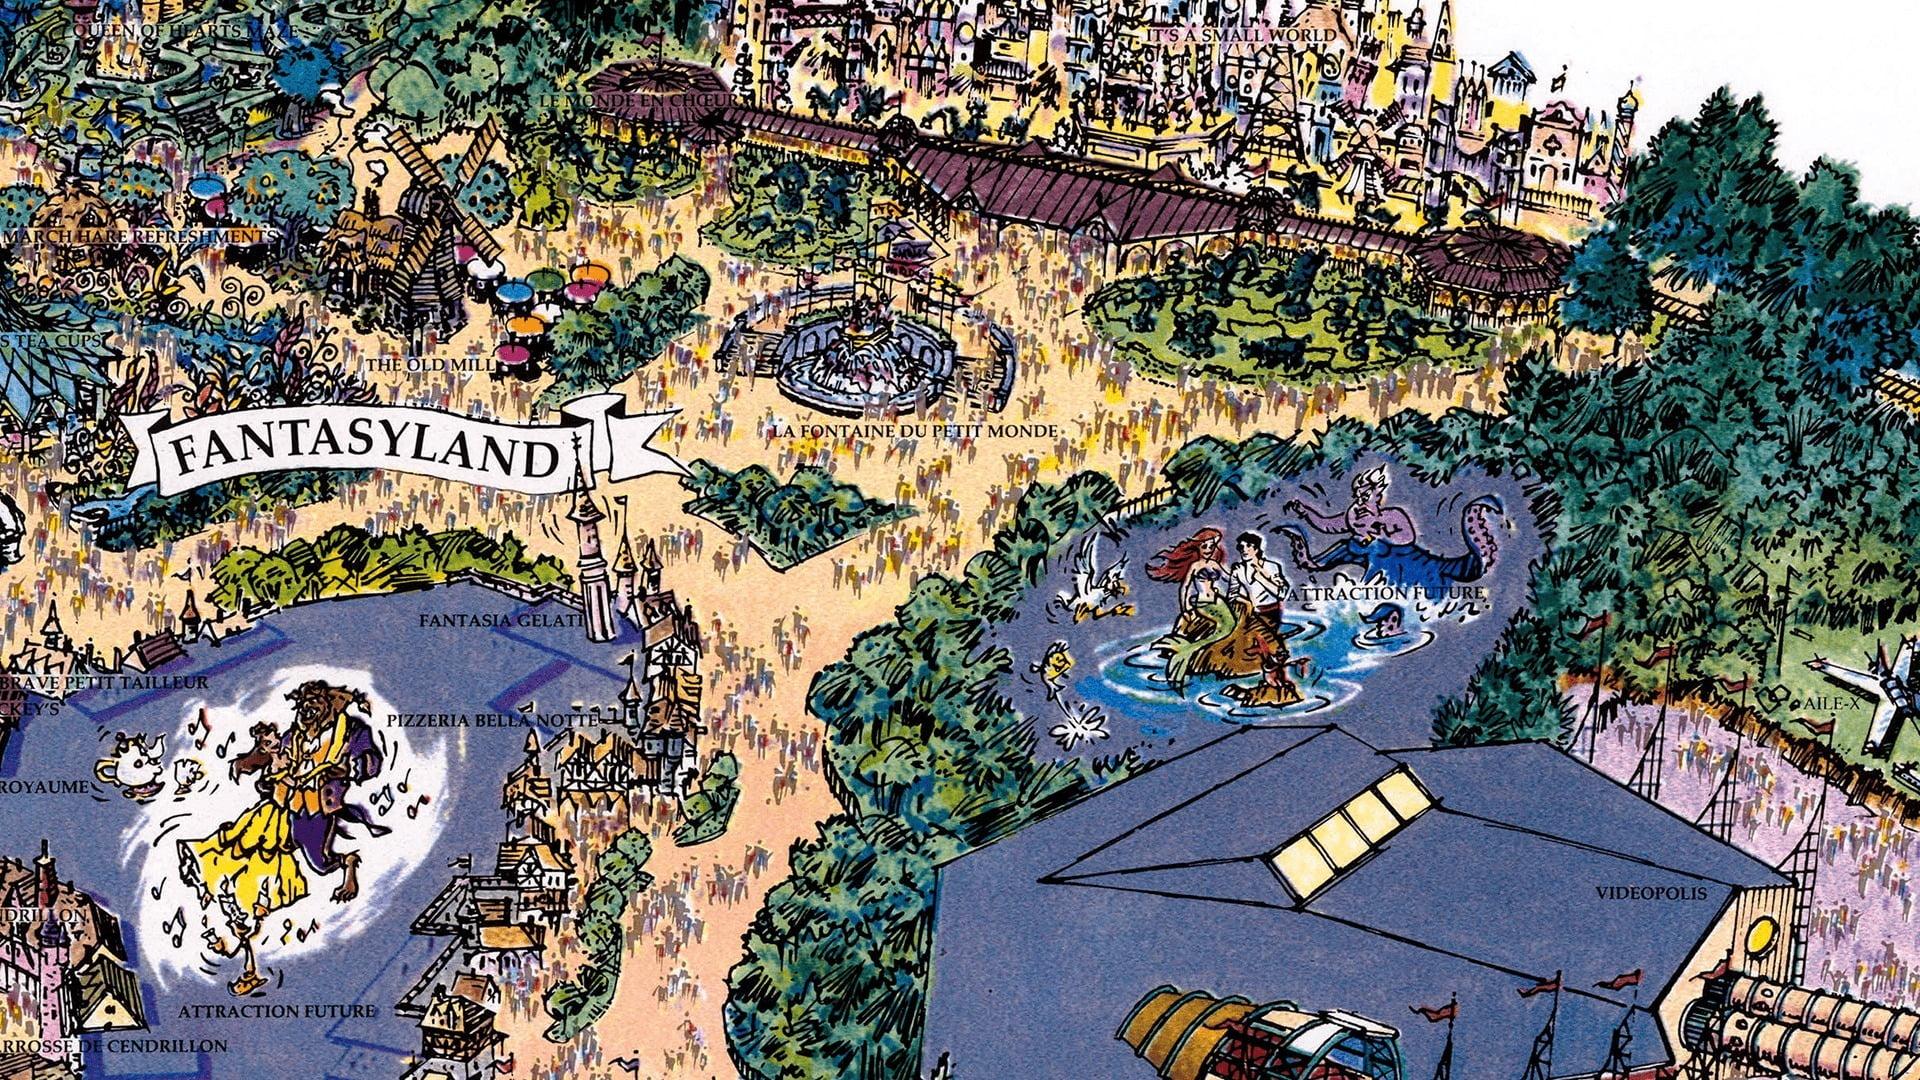 Disneyland Paris Fun Map - 1992